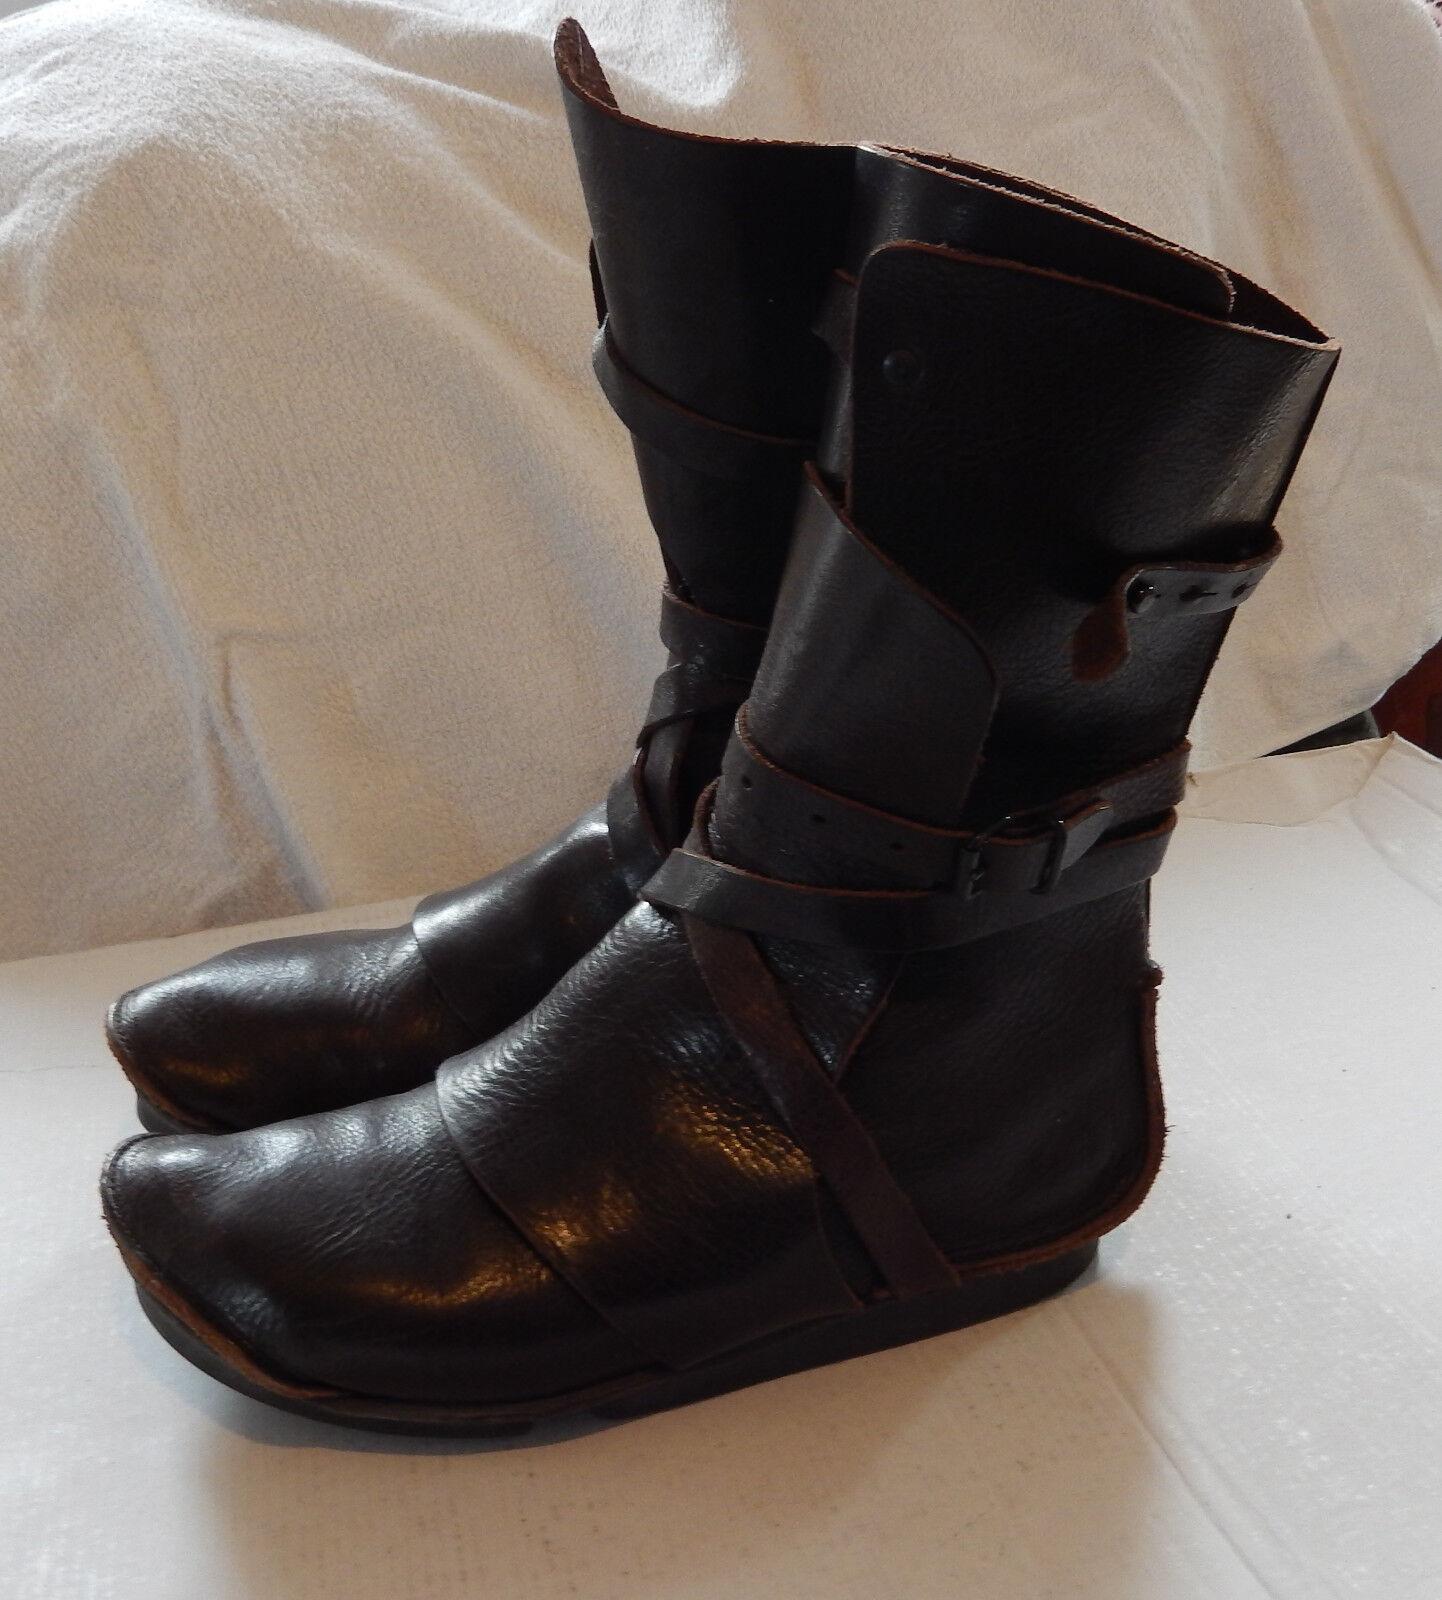 Tripper Knight Bottes Marron Moyen âge 38 bottes marron UK 5.5